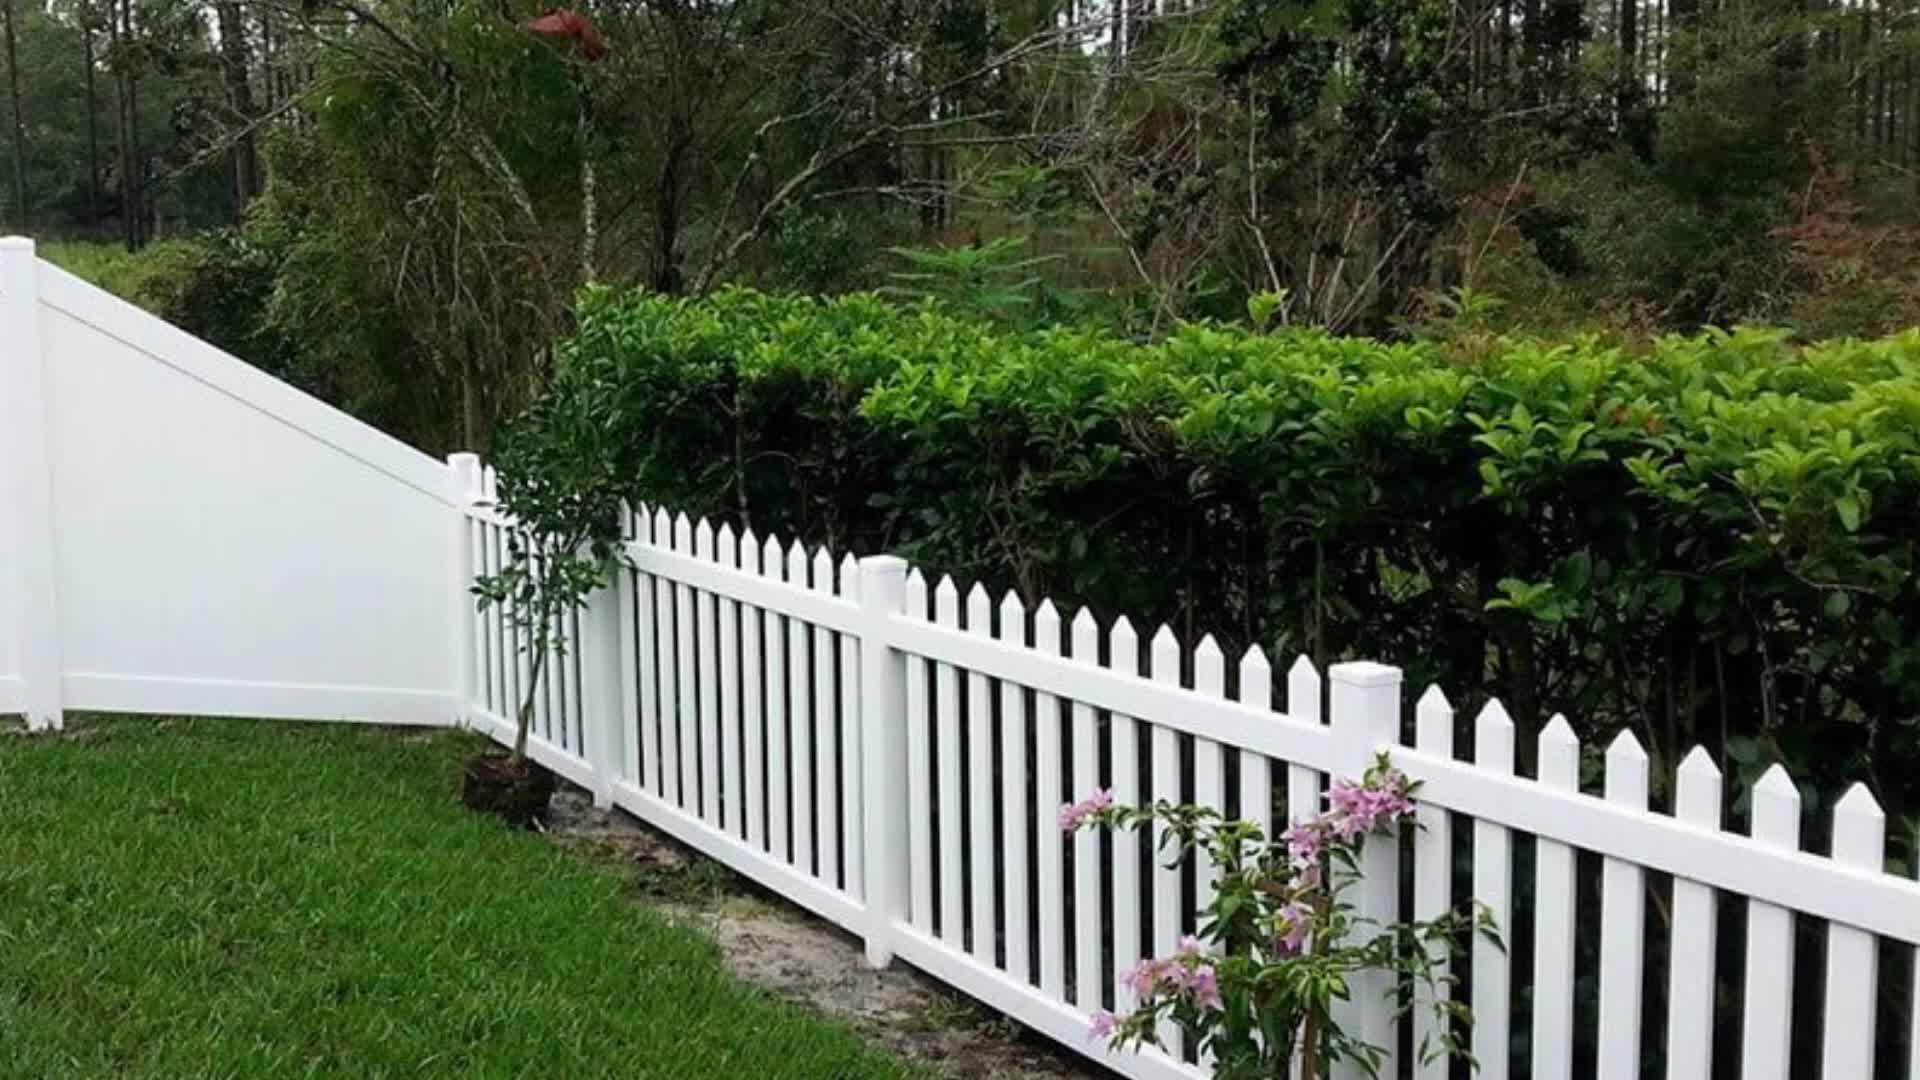 White Plastic Garden Fencing Vinyl Decorative Pvc Picket